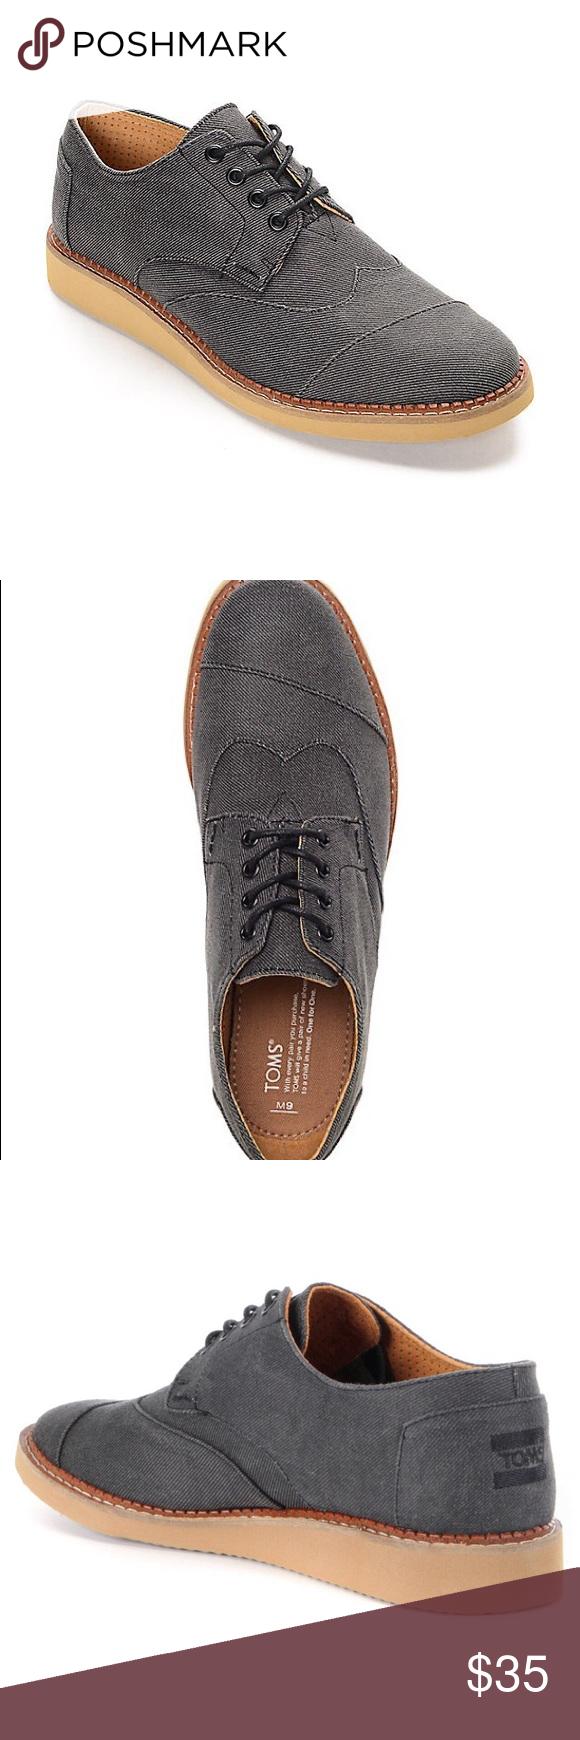 6b249c0e335 Toms Brogue Ash Aviator Twill Shoes Toms Brogue Ash Aviator Twill Shoes Pre  owned Size 10 Toms Shoes Oxfords   Derbys